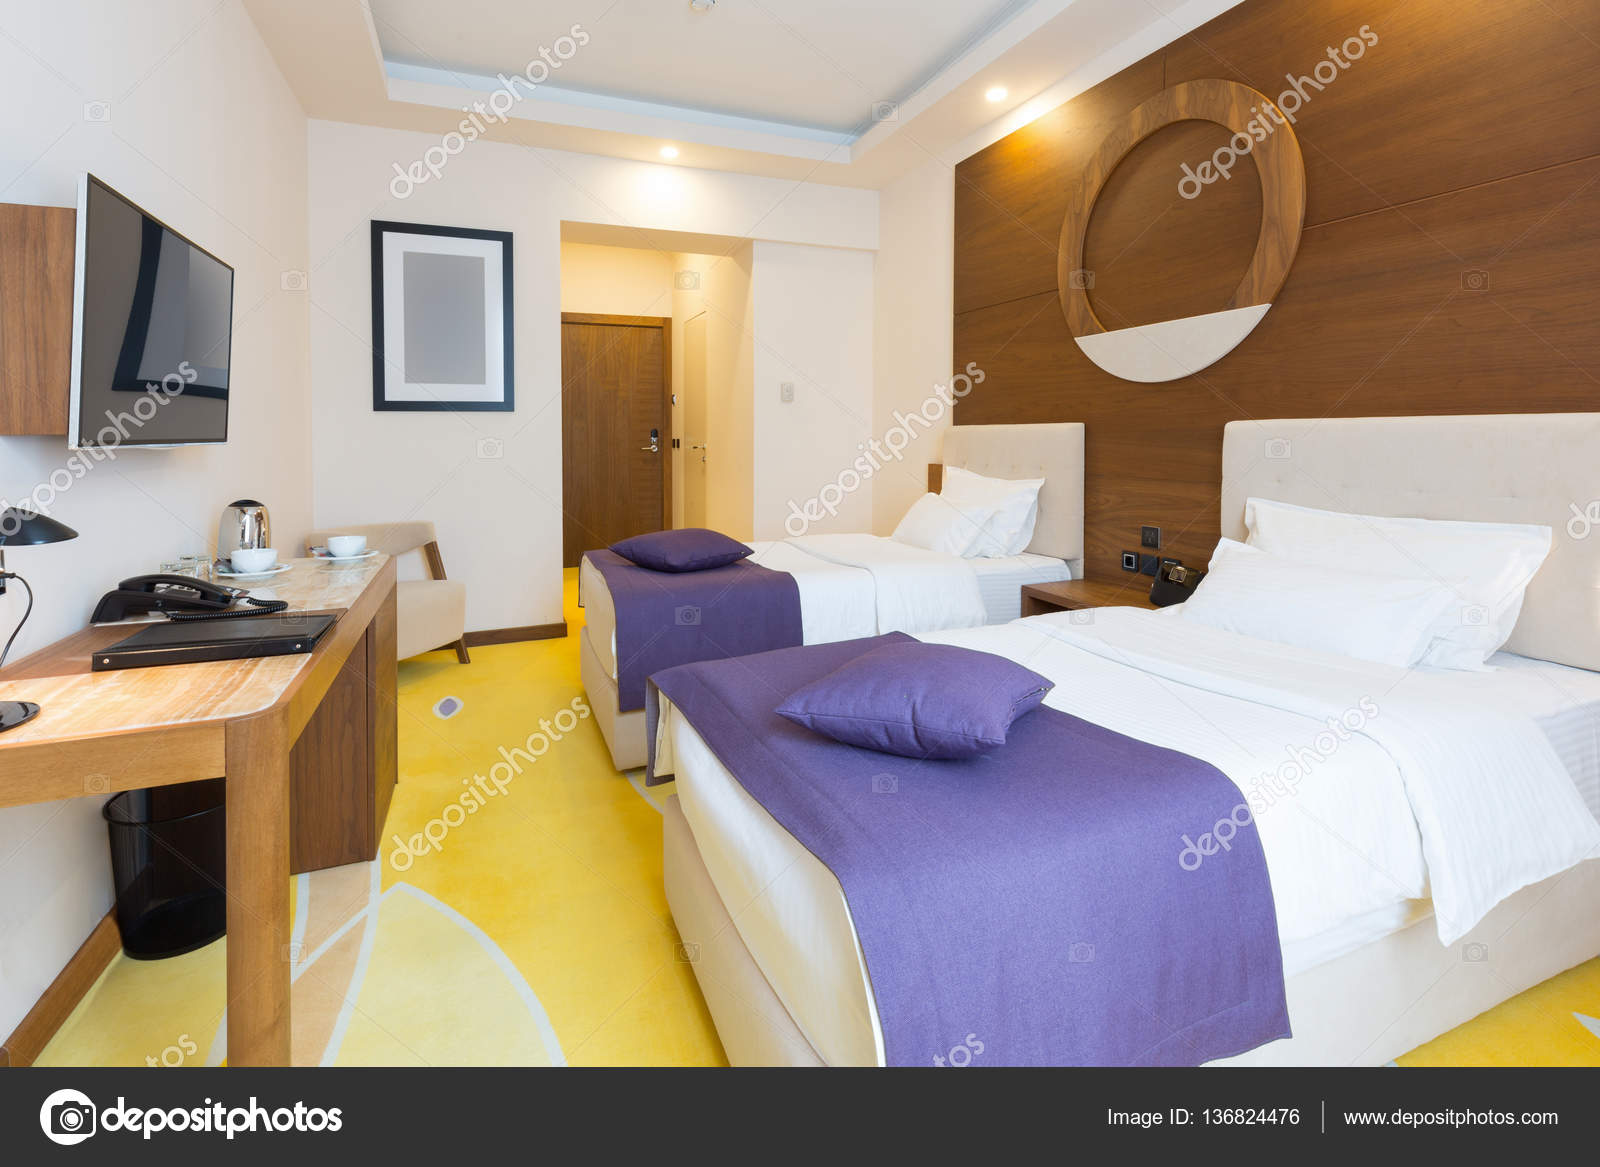 Hotel Slaapkamer Inrichting : Moderne nieuw hotel slaapkamer interieur u stockfoto rilueda